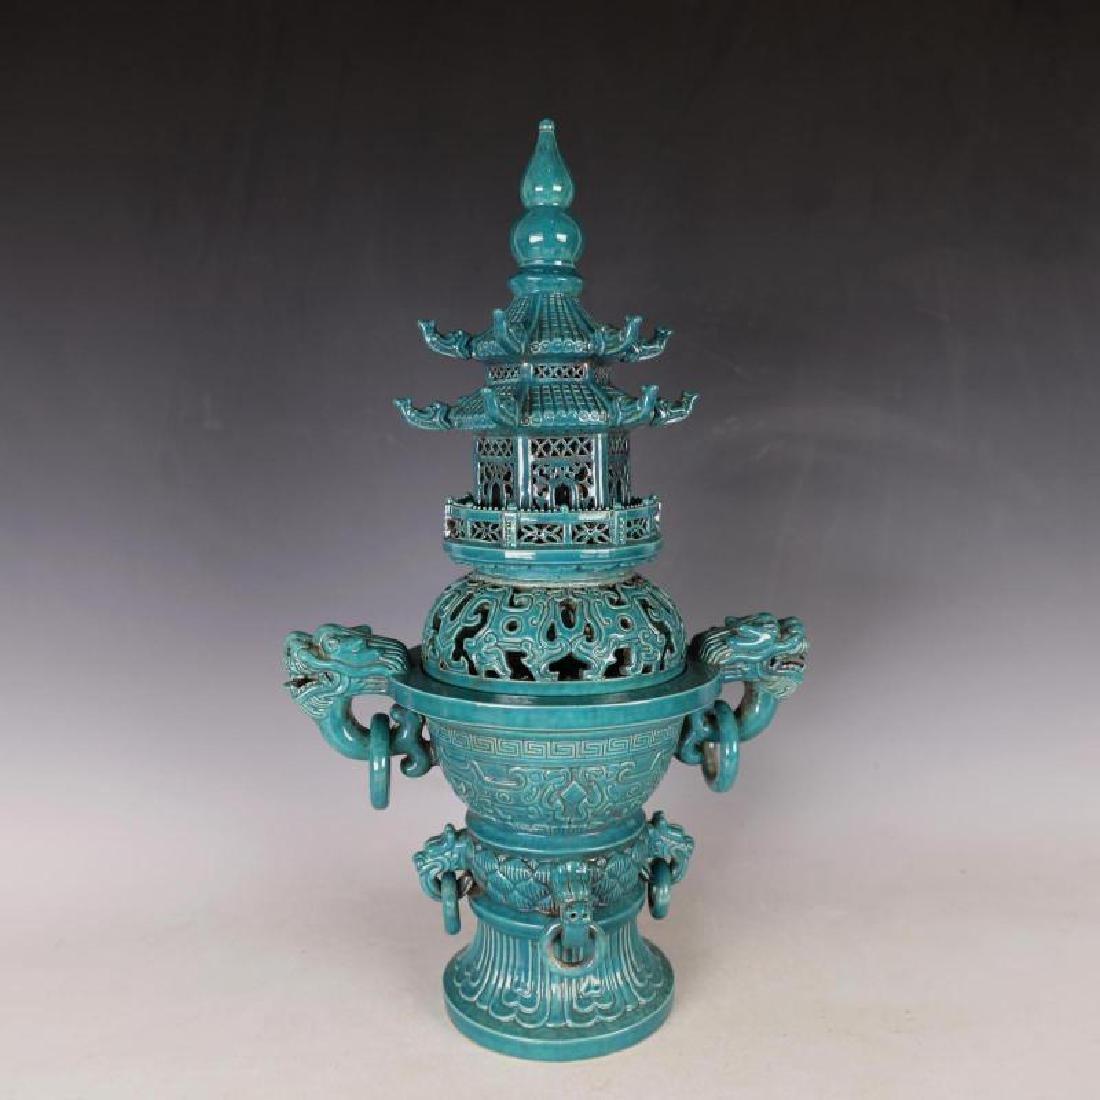 A Big Peacock Green Glaze Aroma Stove